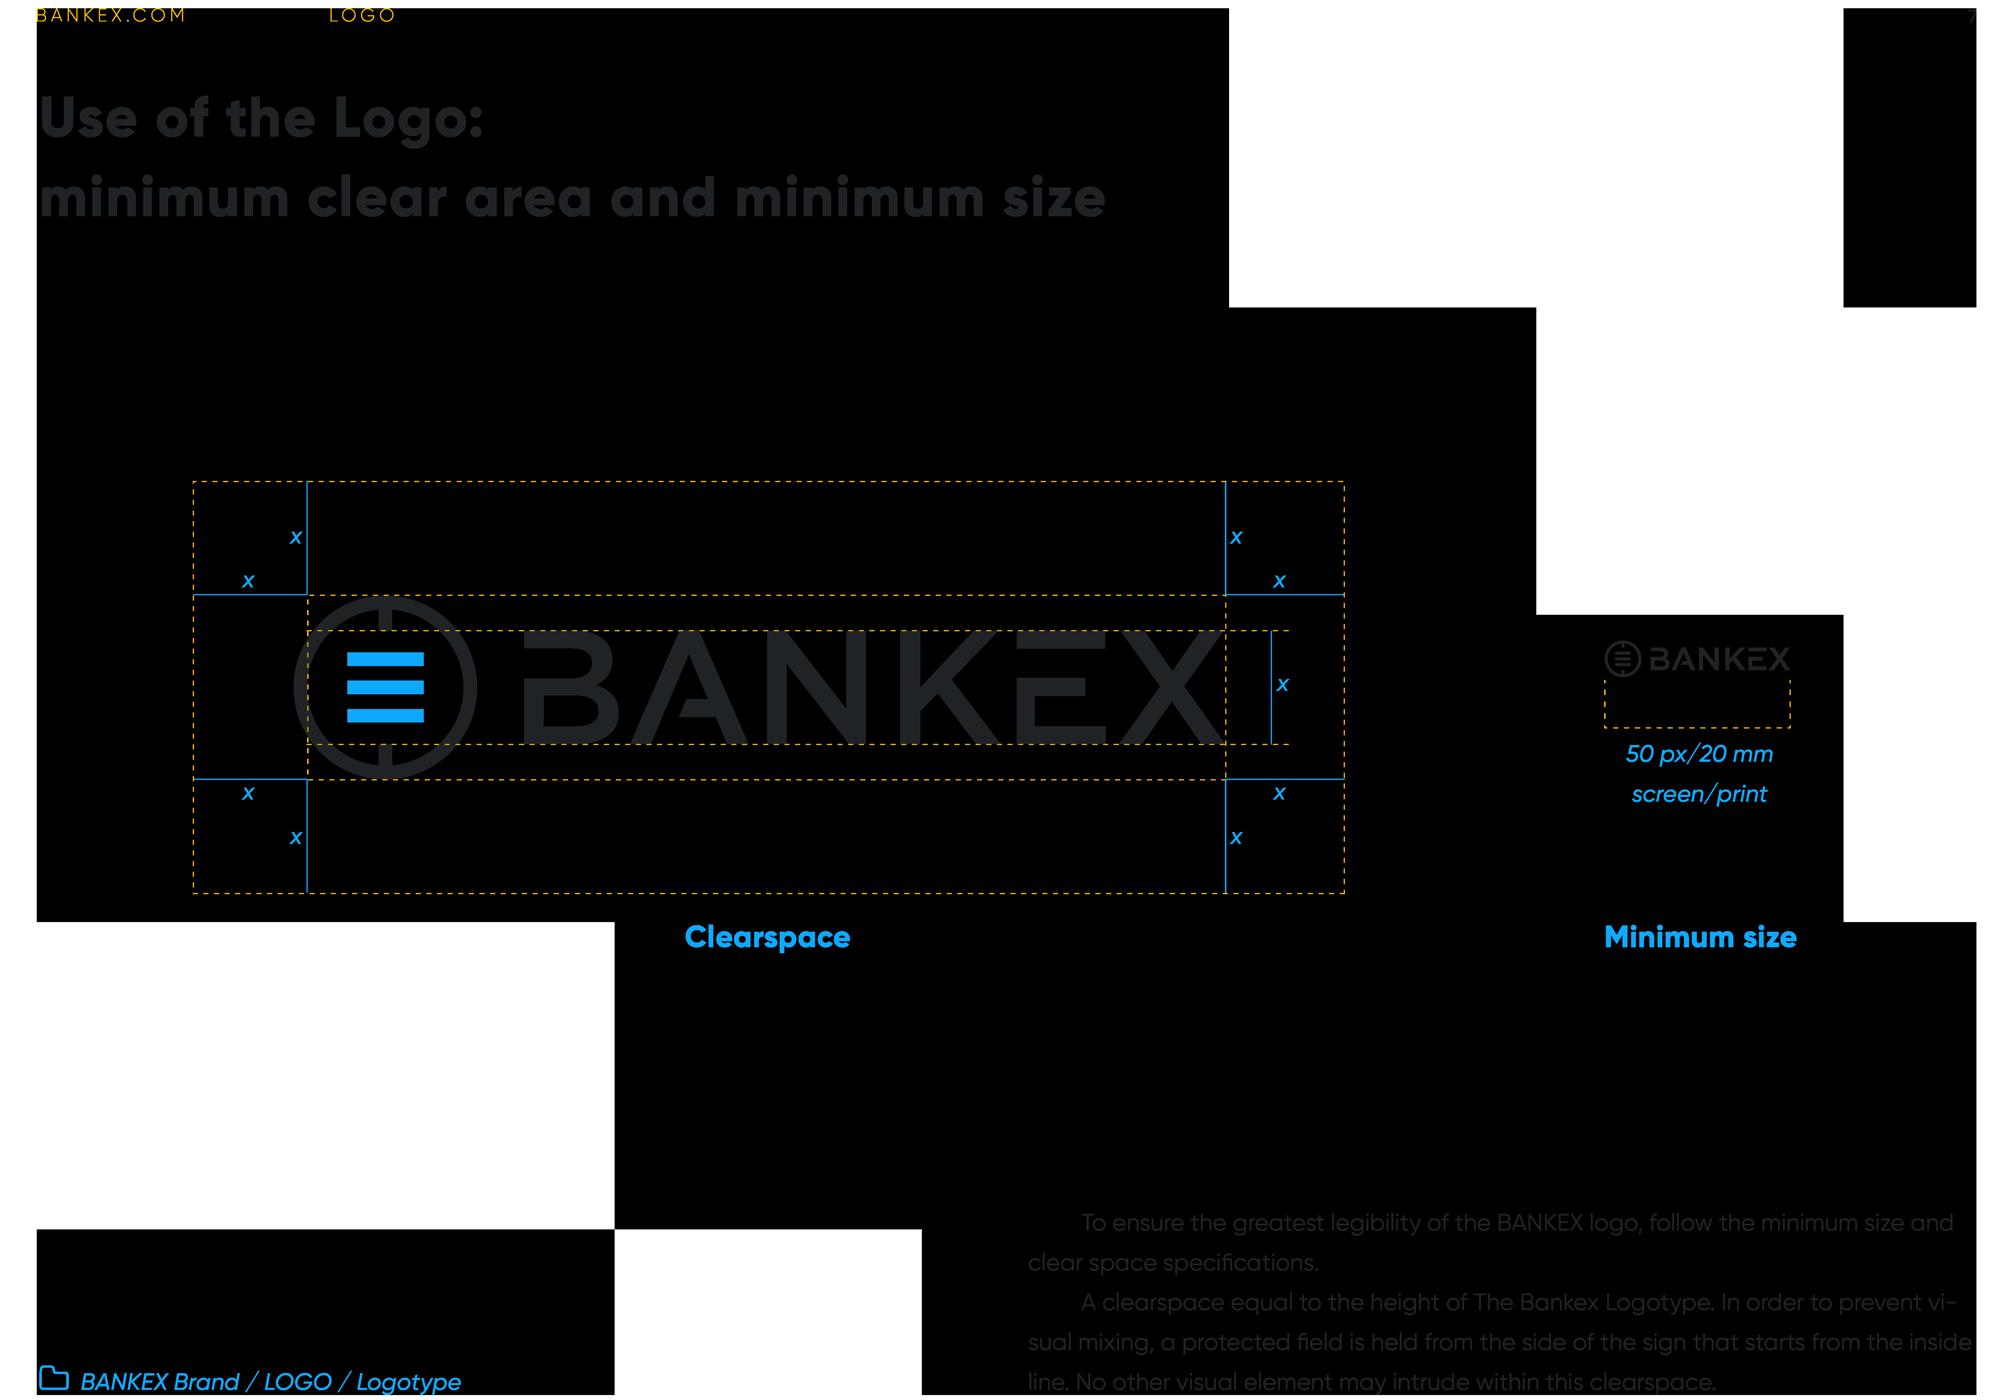 bankex_brandook_web-7.png